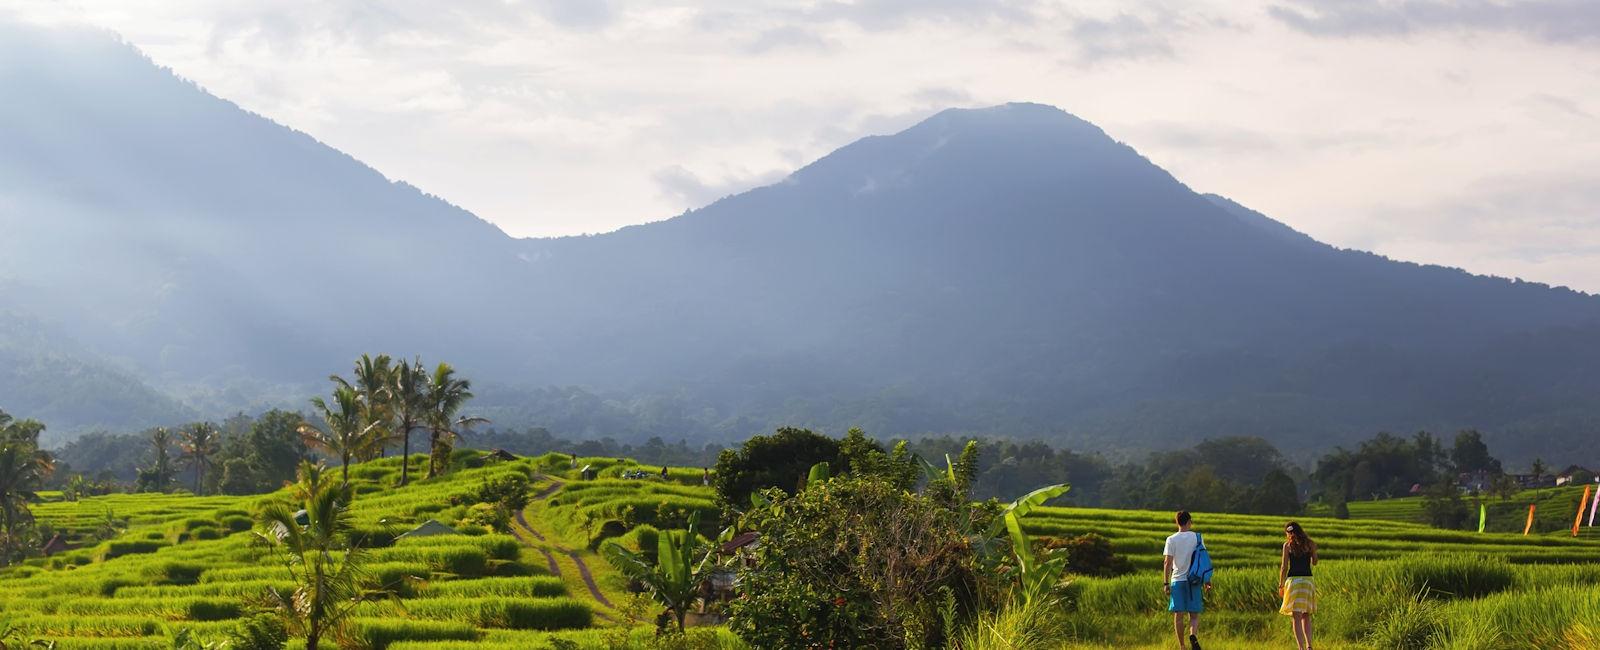 Ubud, main image of rice paddies